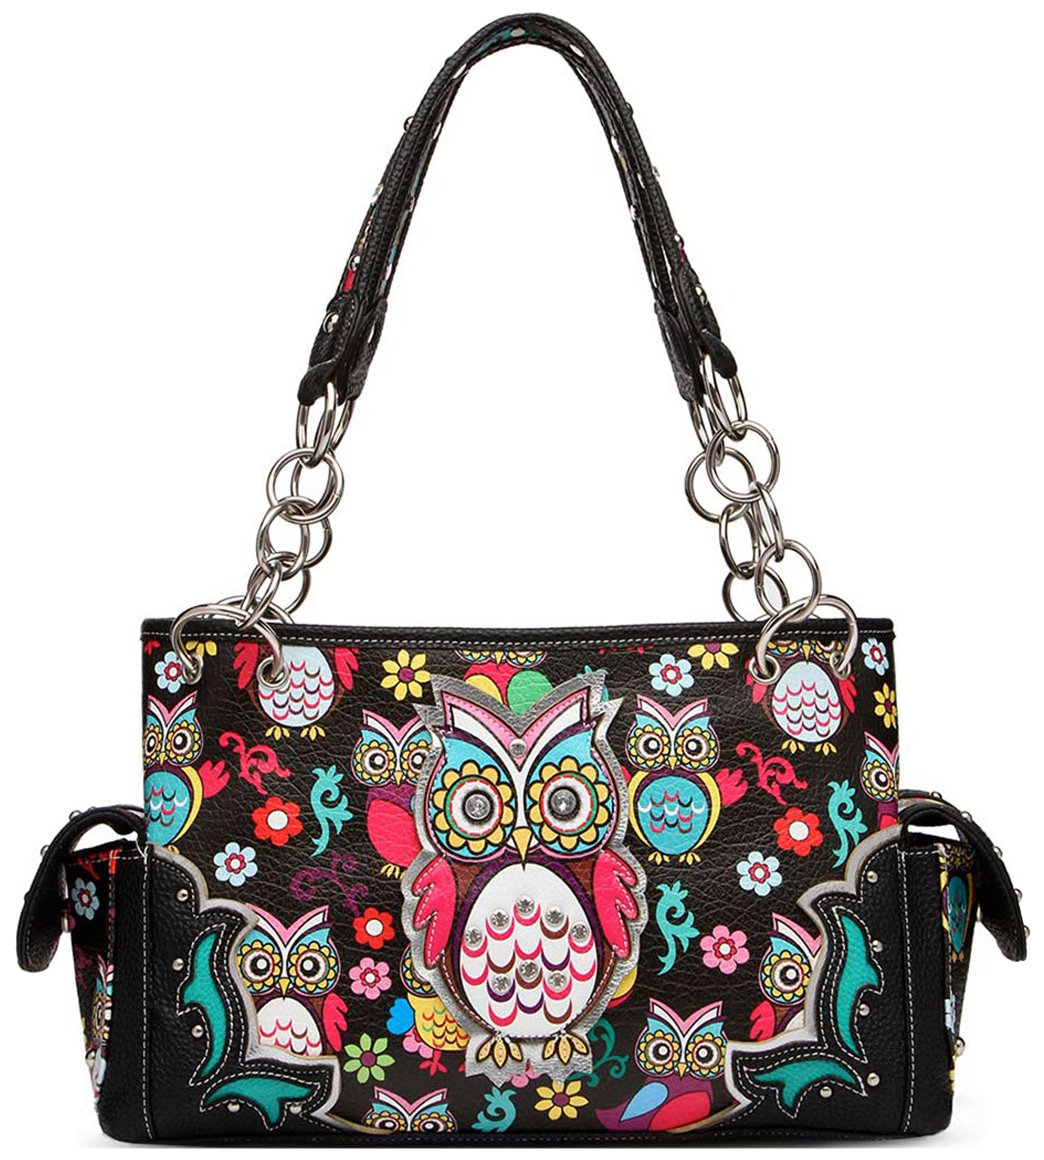 Colorful Owl Flower Rhinestone Concealed Purse Country Western Spring Style Handbag Women Shoulder Bags (Black)